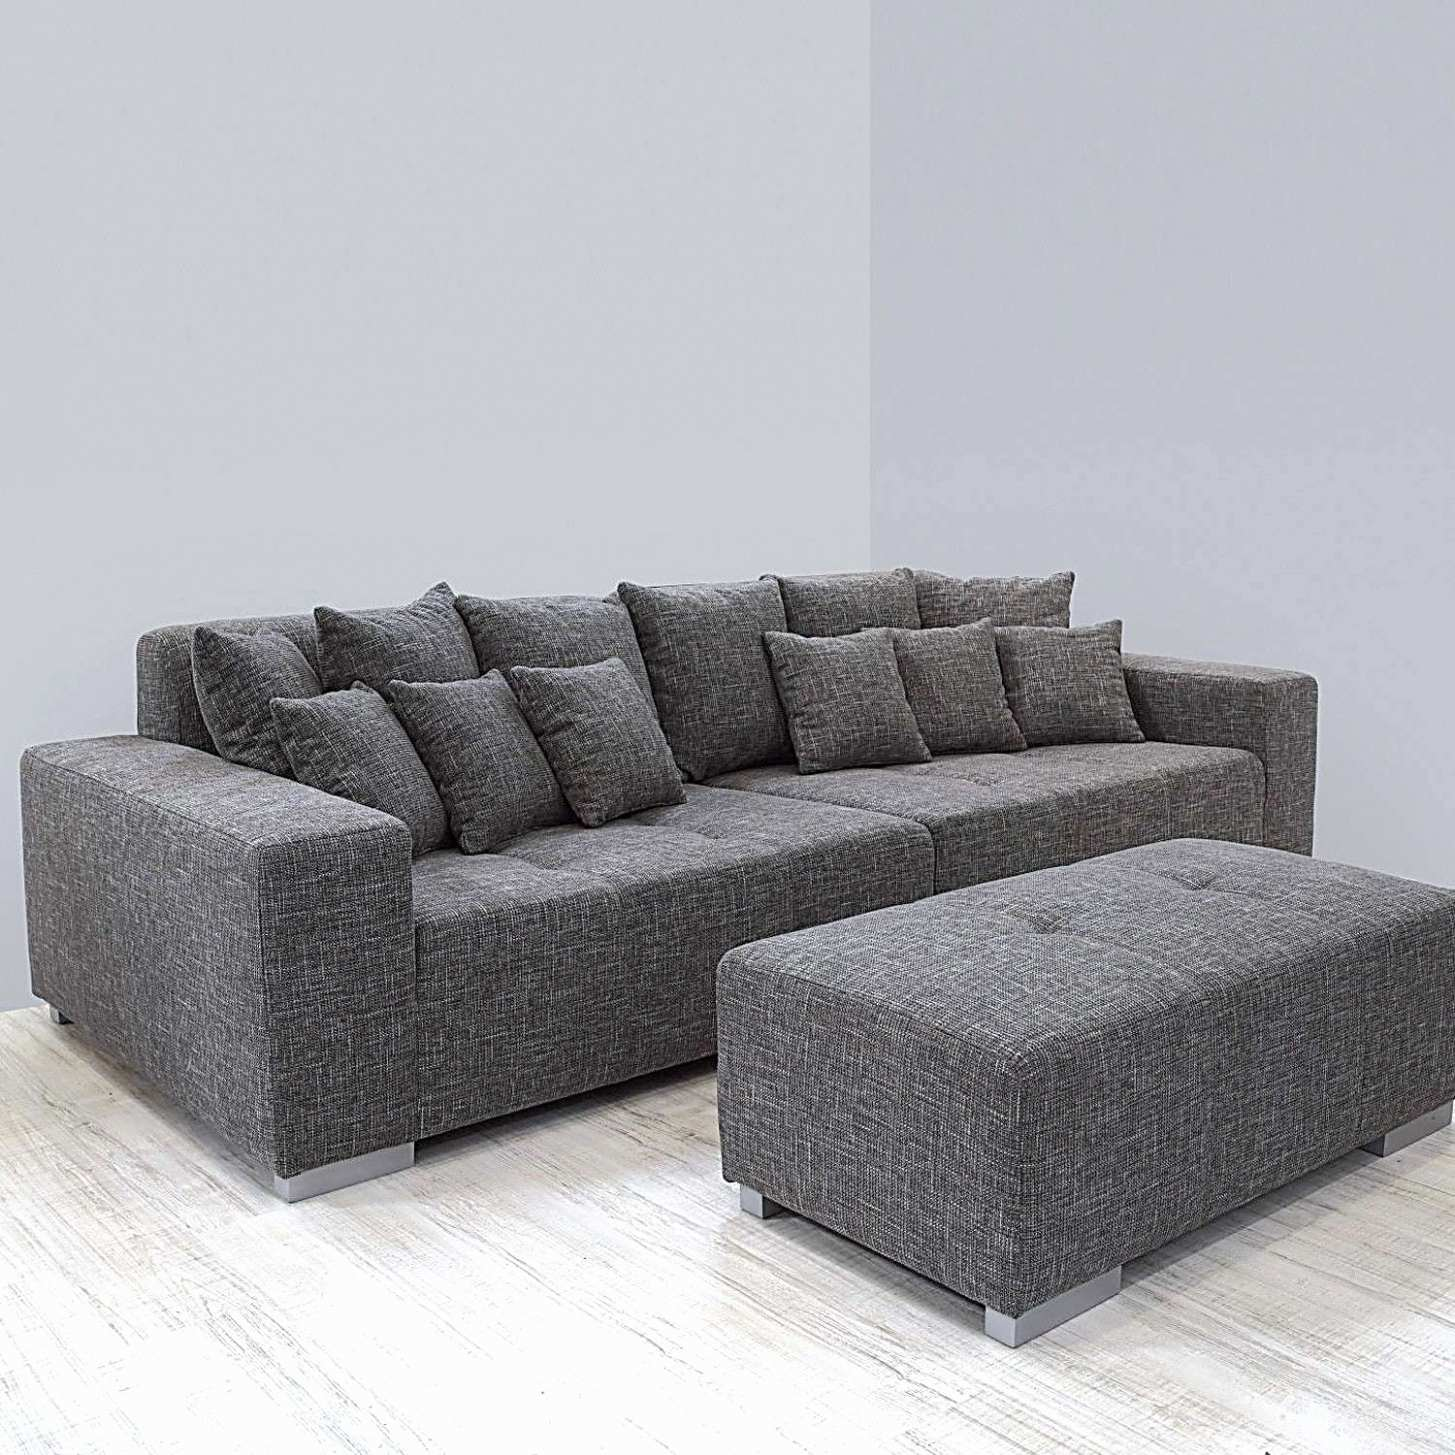 sofa beige stoff frisch 46 neu big sofa xxl lutz of sofa beige stoff